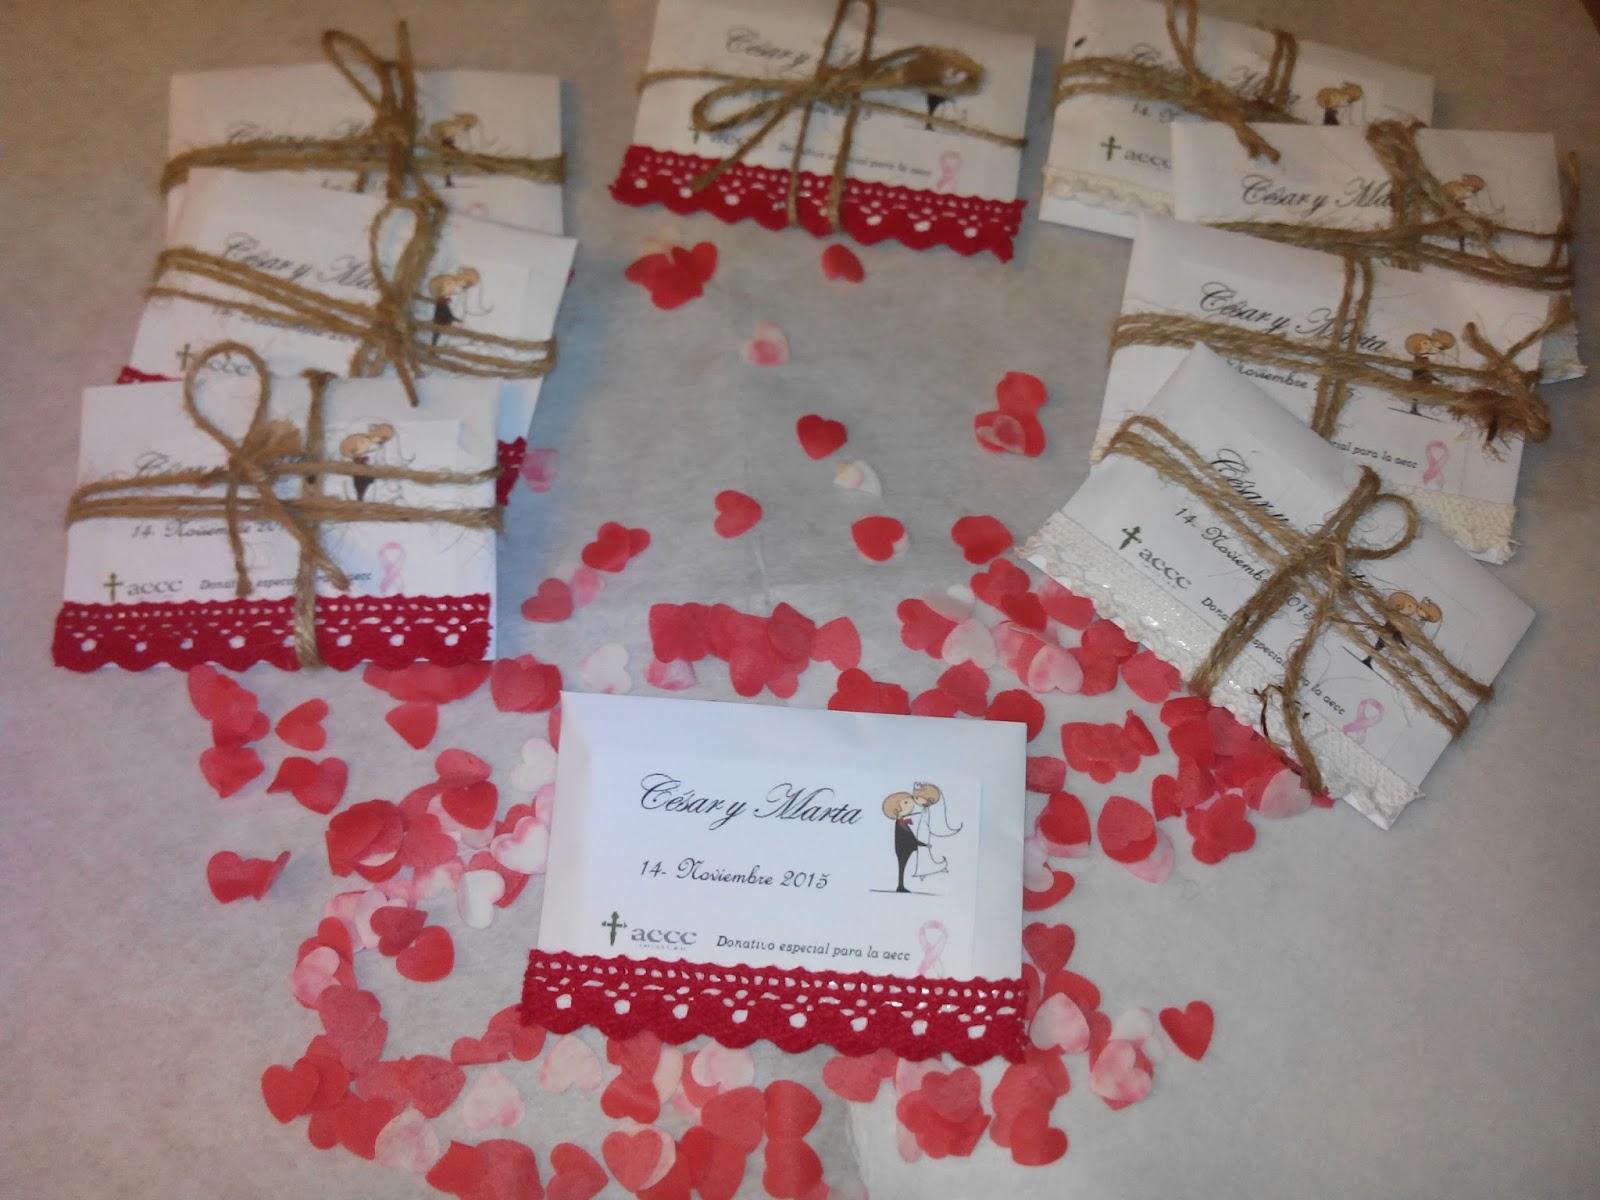 Laumiss especial boda - Aecc regalos boda ...